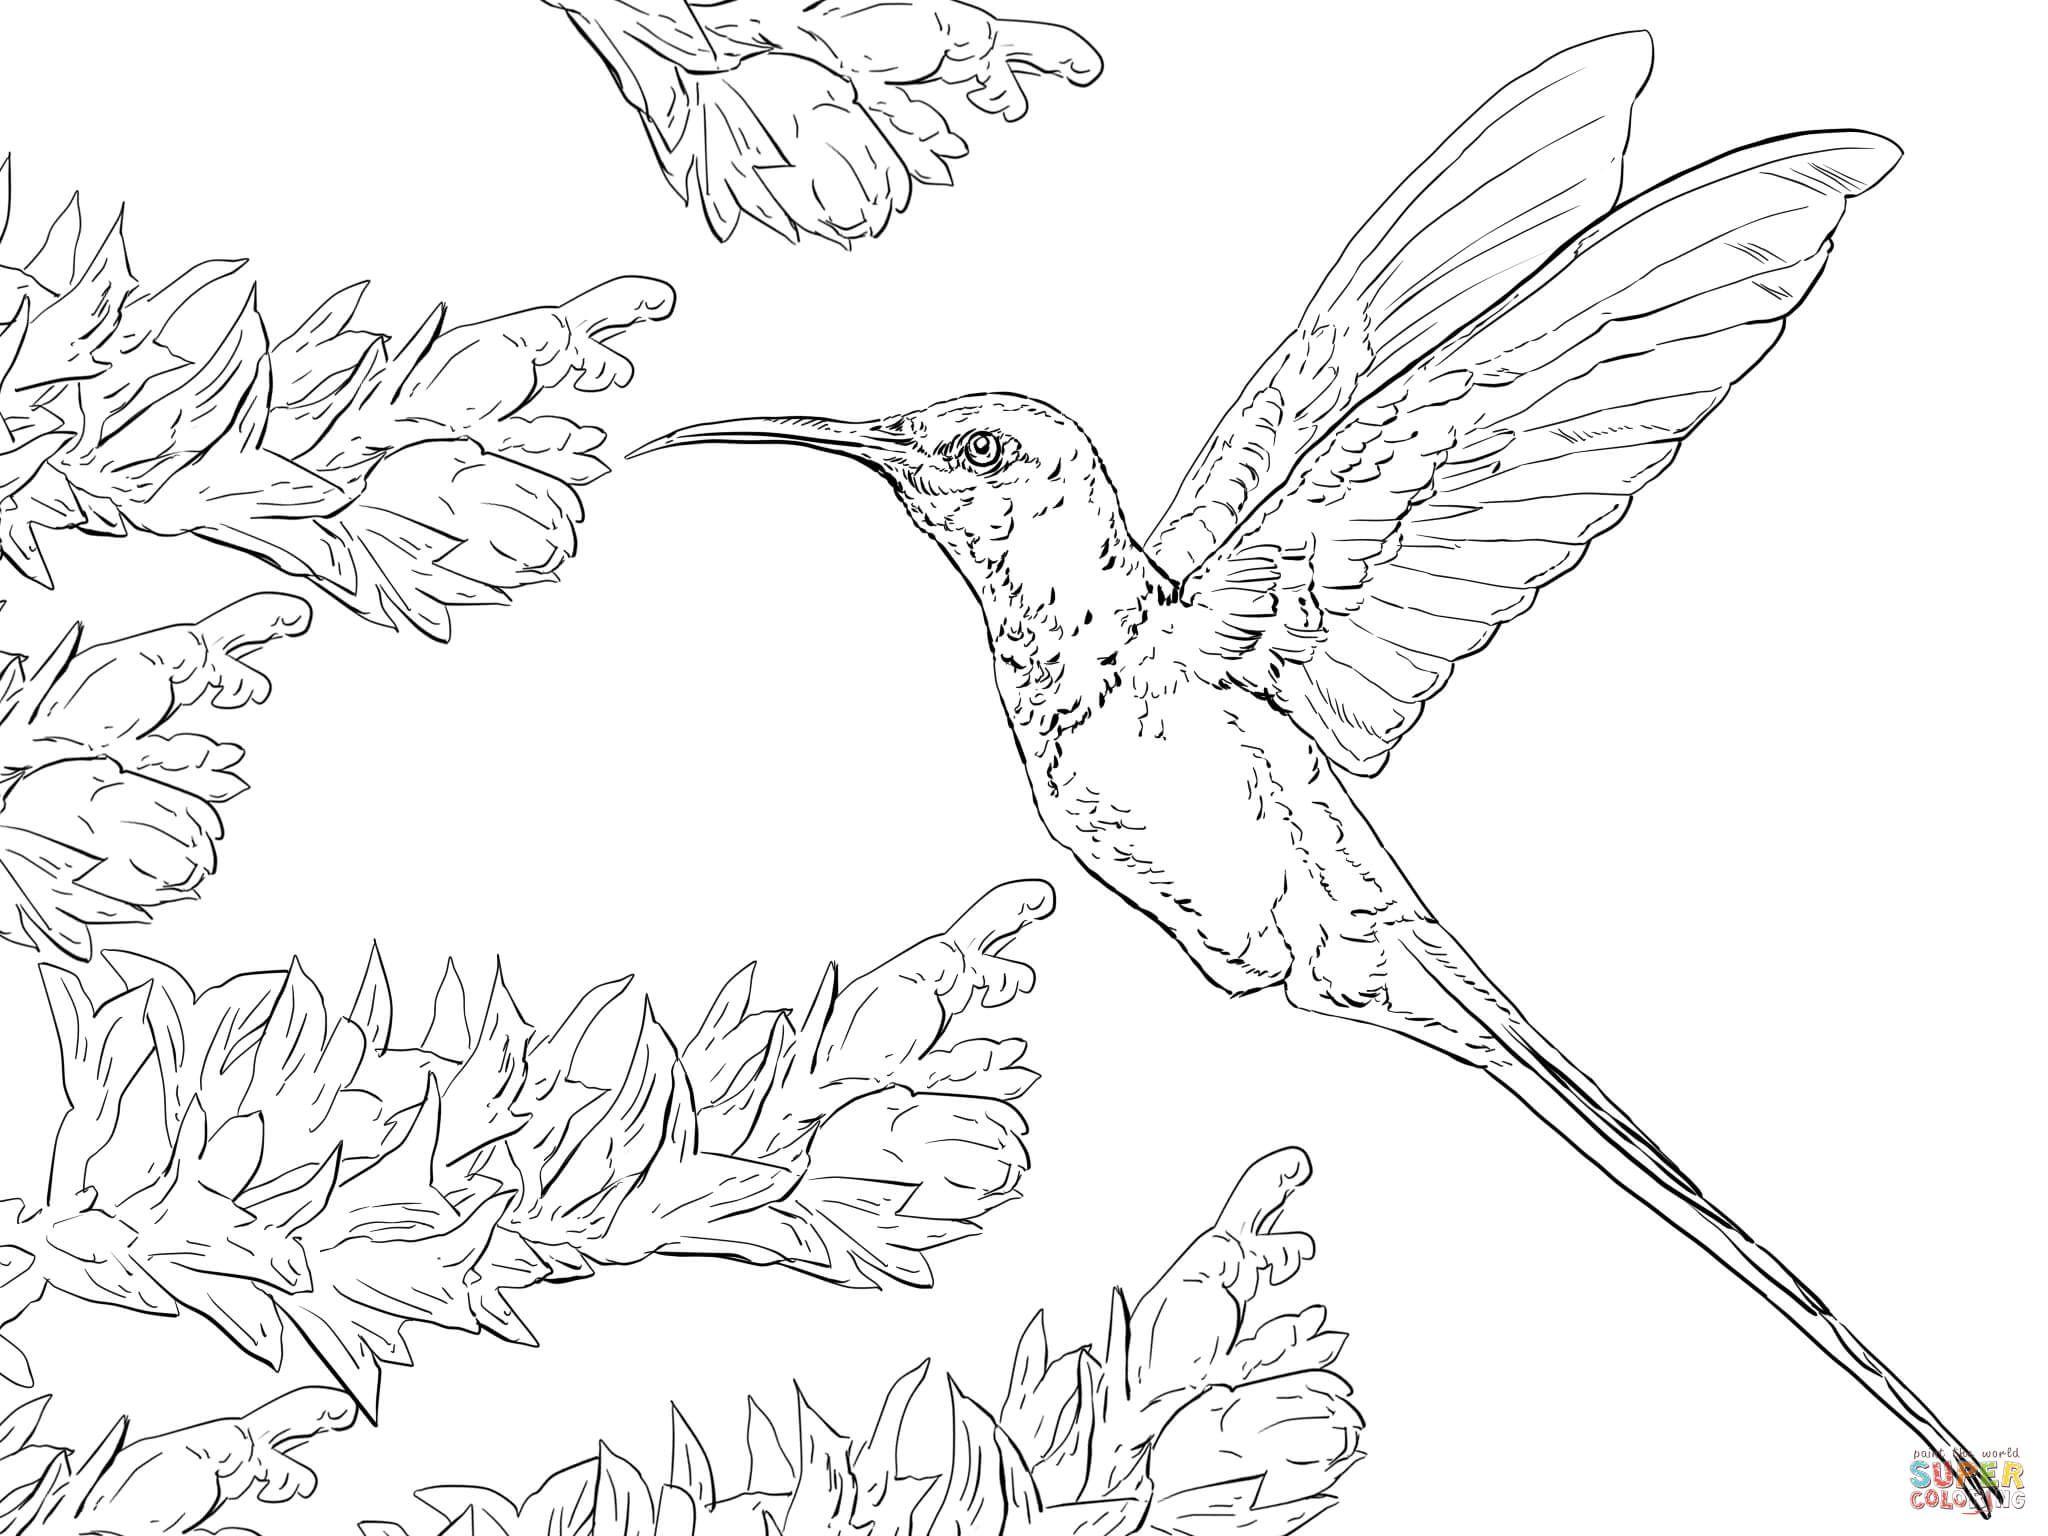 Pin von AutRose auf Quilts - Applique & Inspirations | Pinterest ...